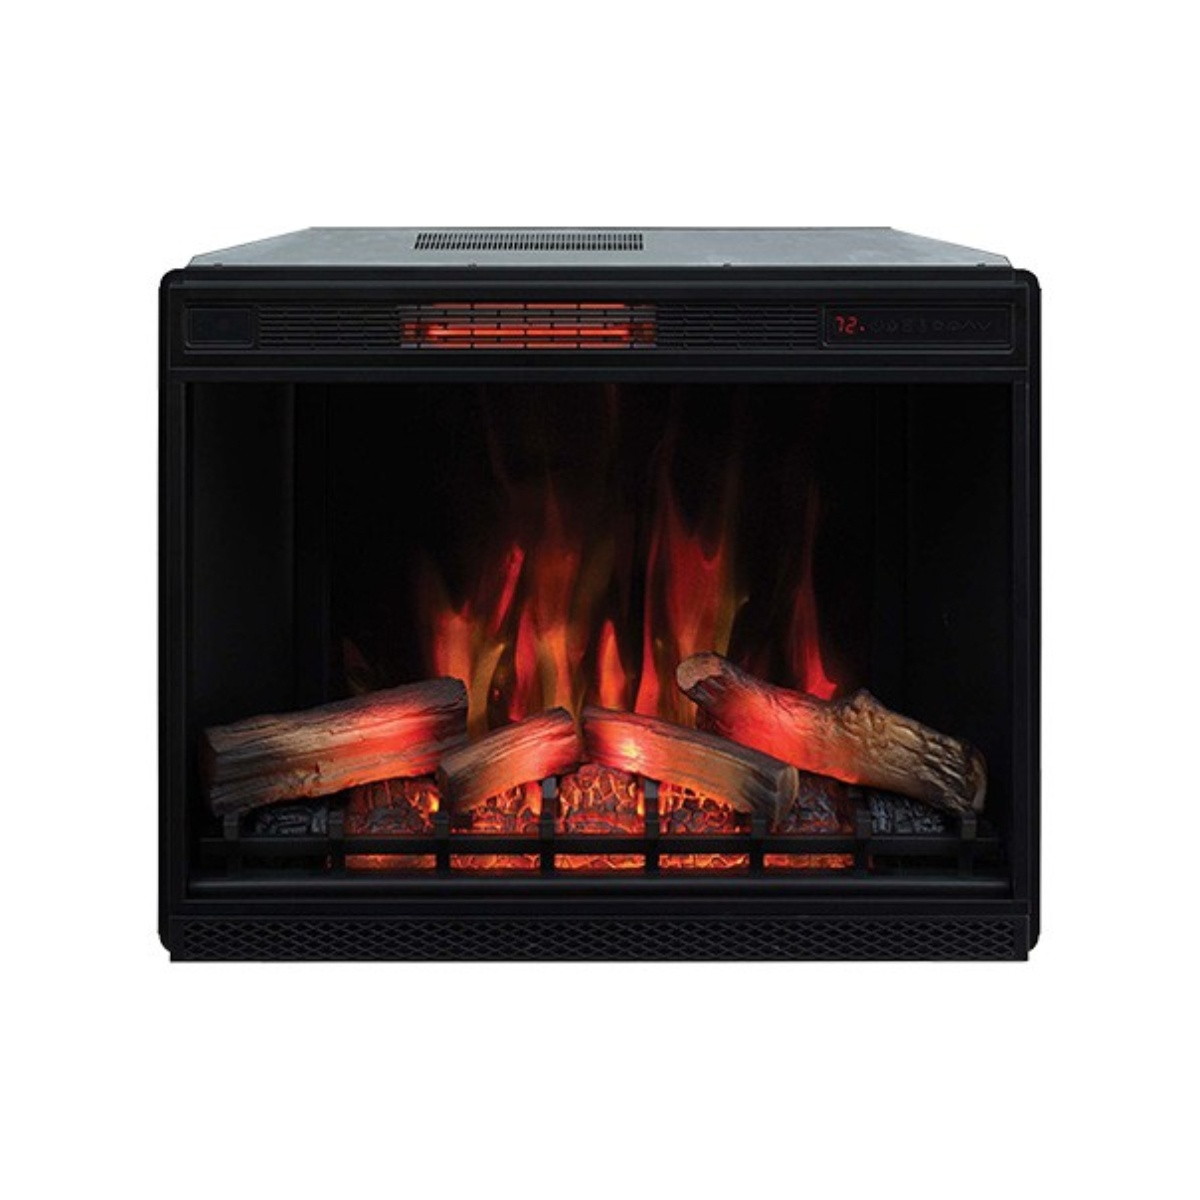 33II042FGL classic flame 33 inch insert electric fireplace